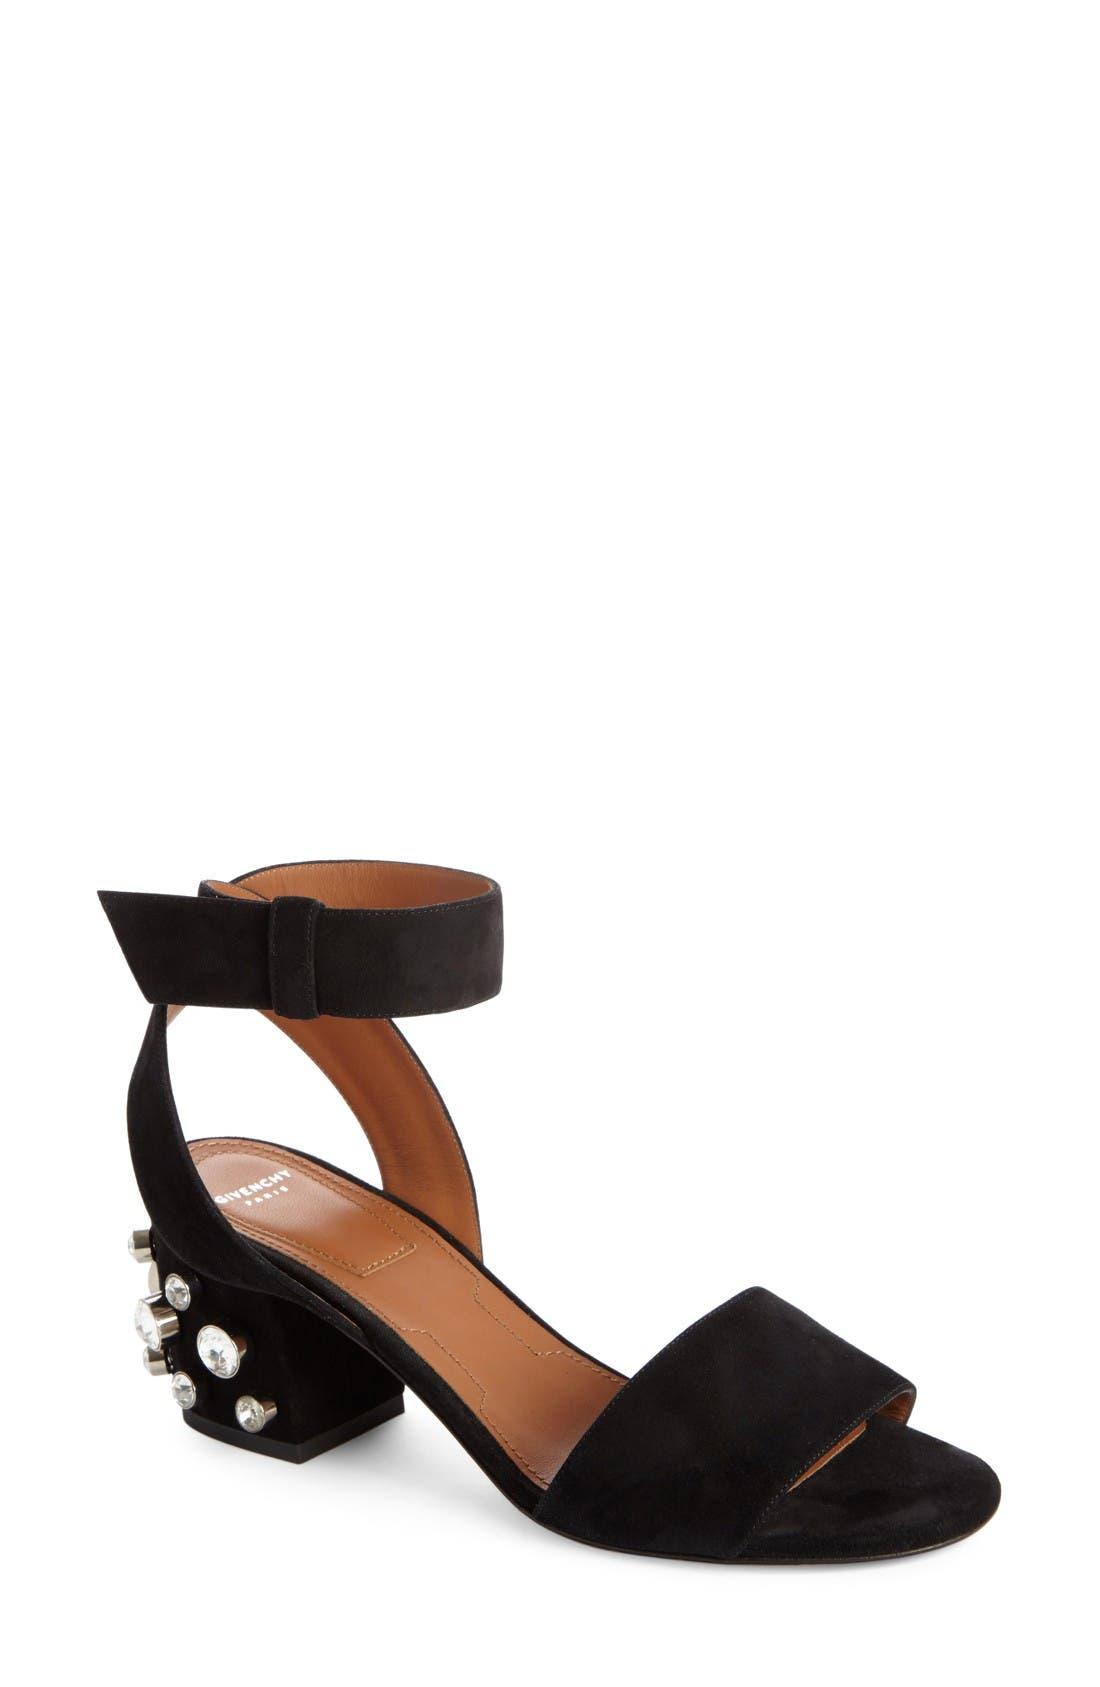 Givenchy Paris Crystal Ankle Strap Sandal (Women)